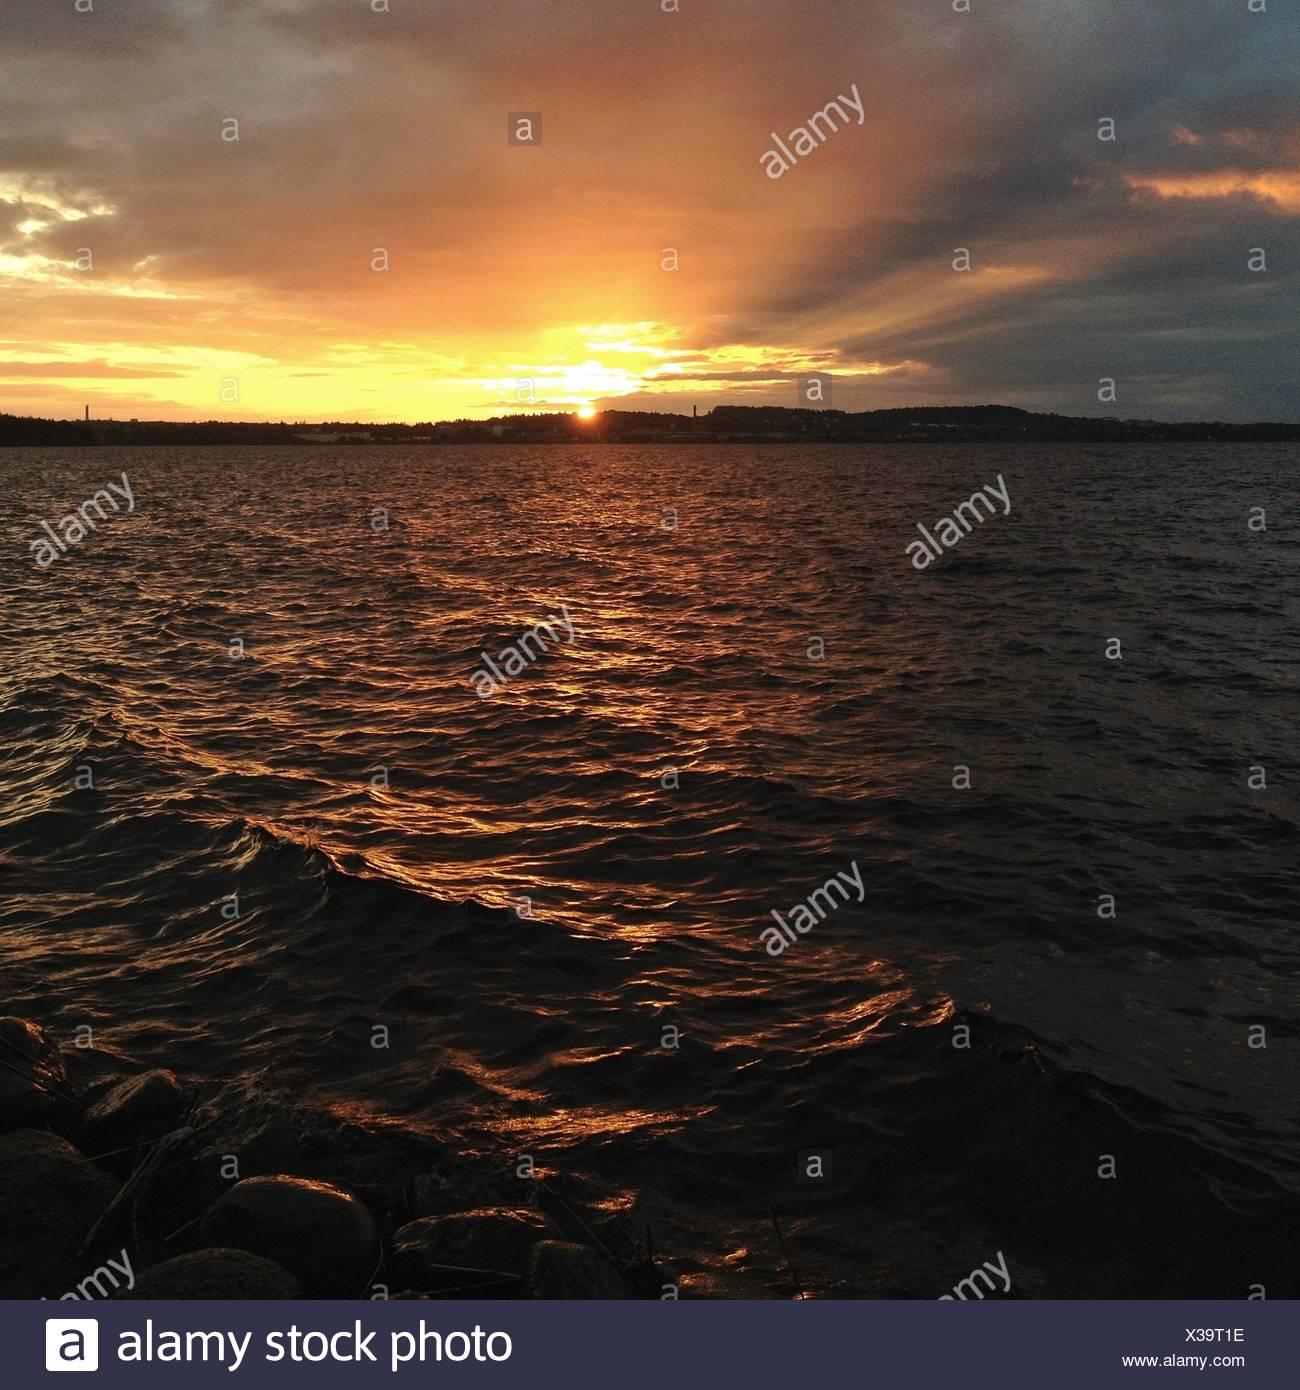 Sunset across lake - Stock Image